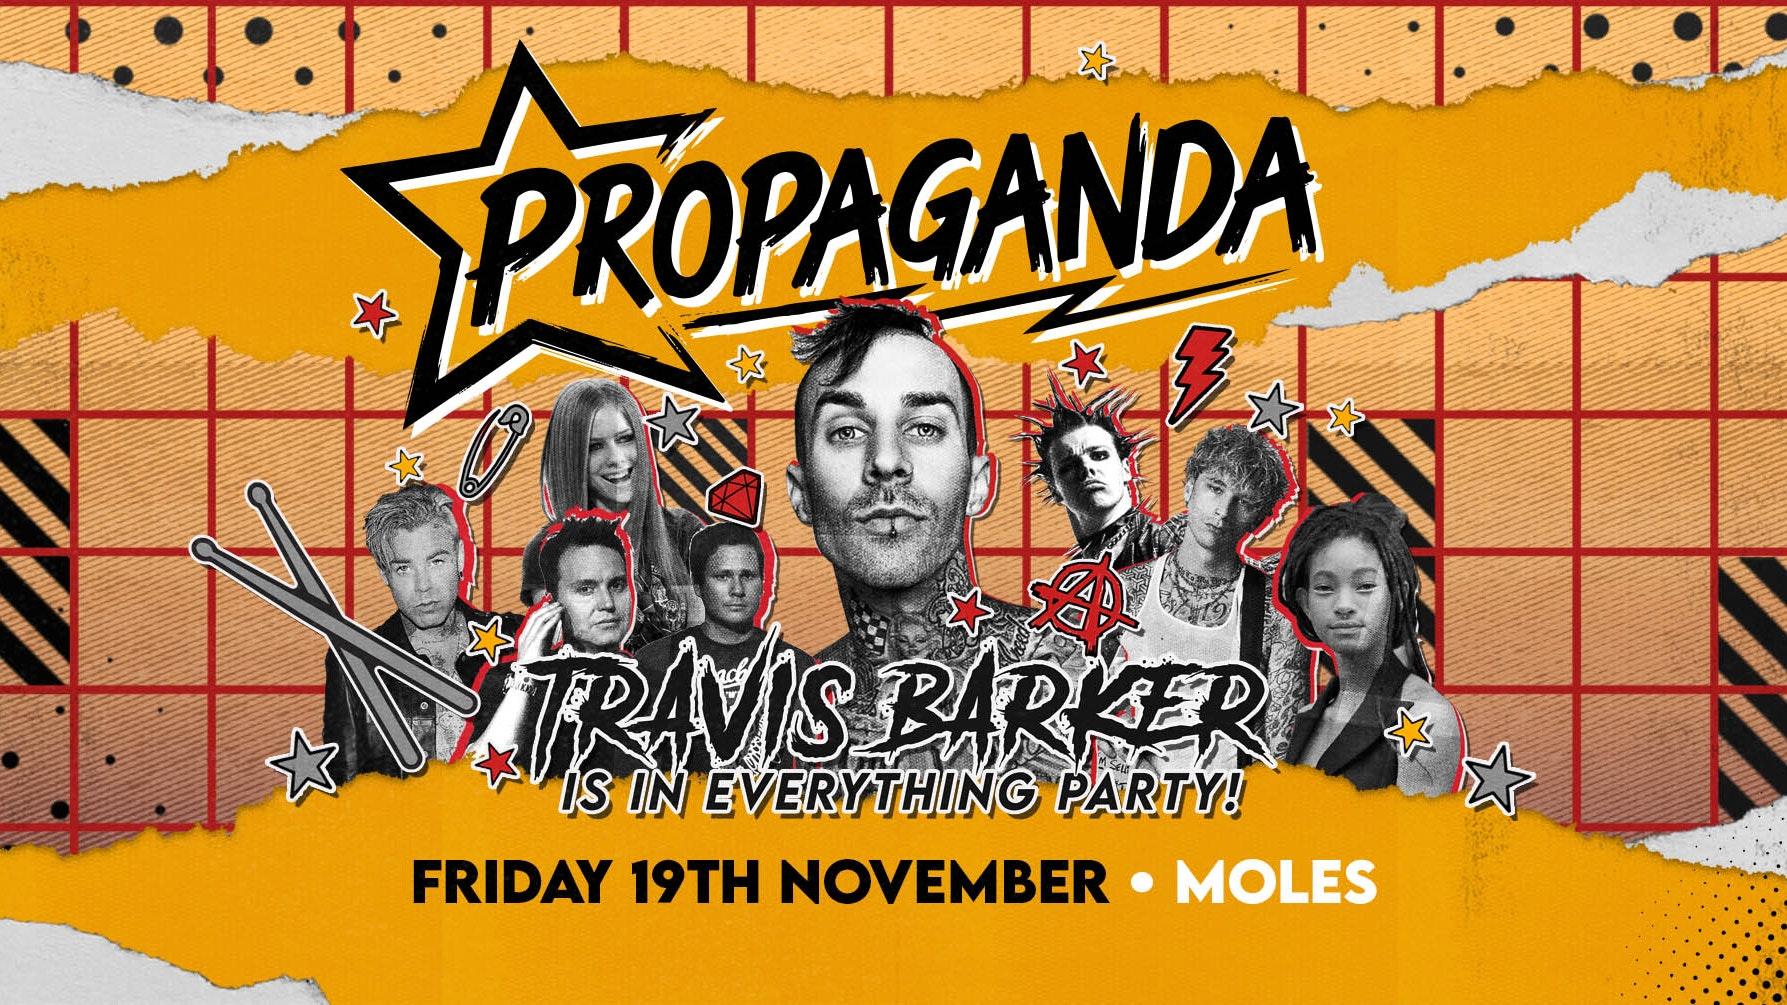 Propaganda Bath – Travis Barker Is In Everything Party!